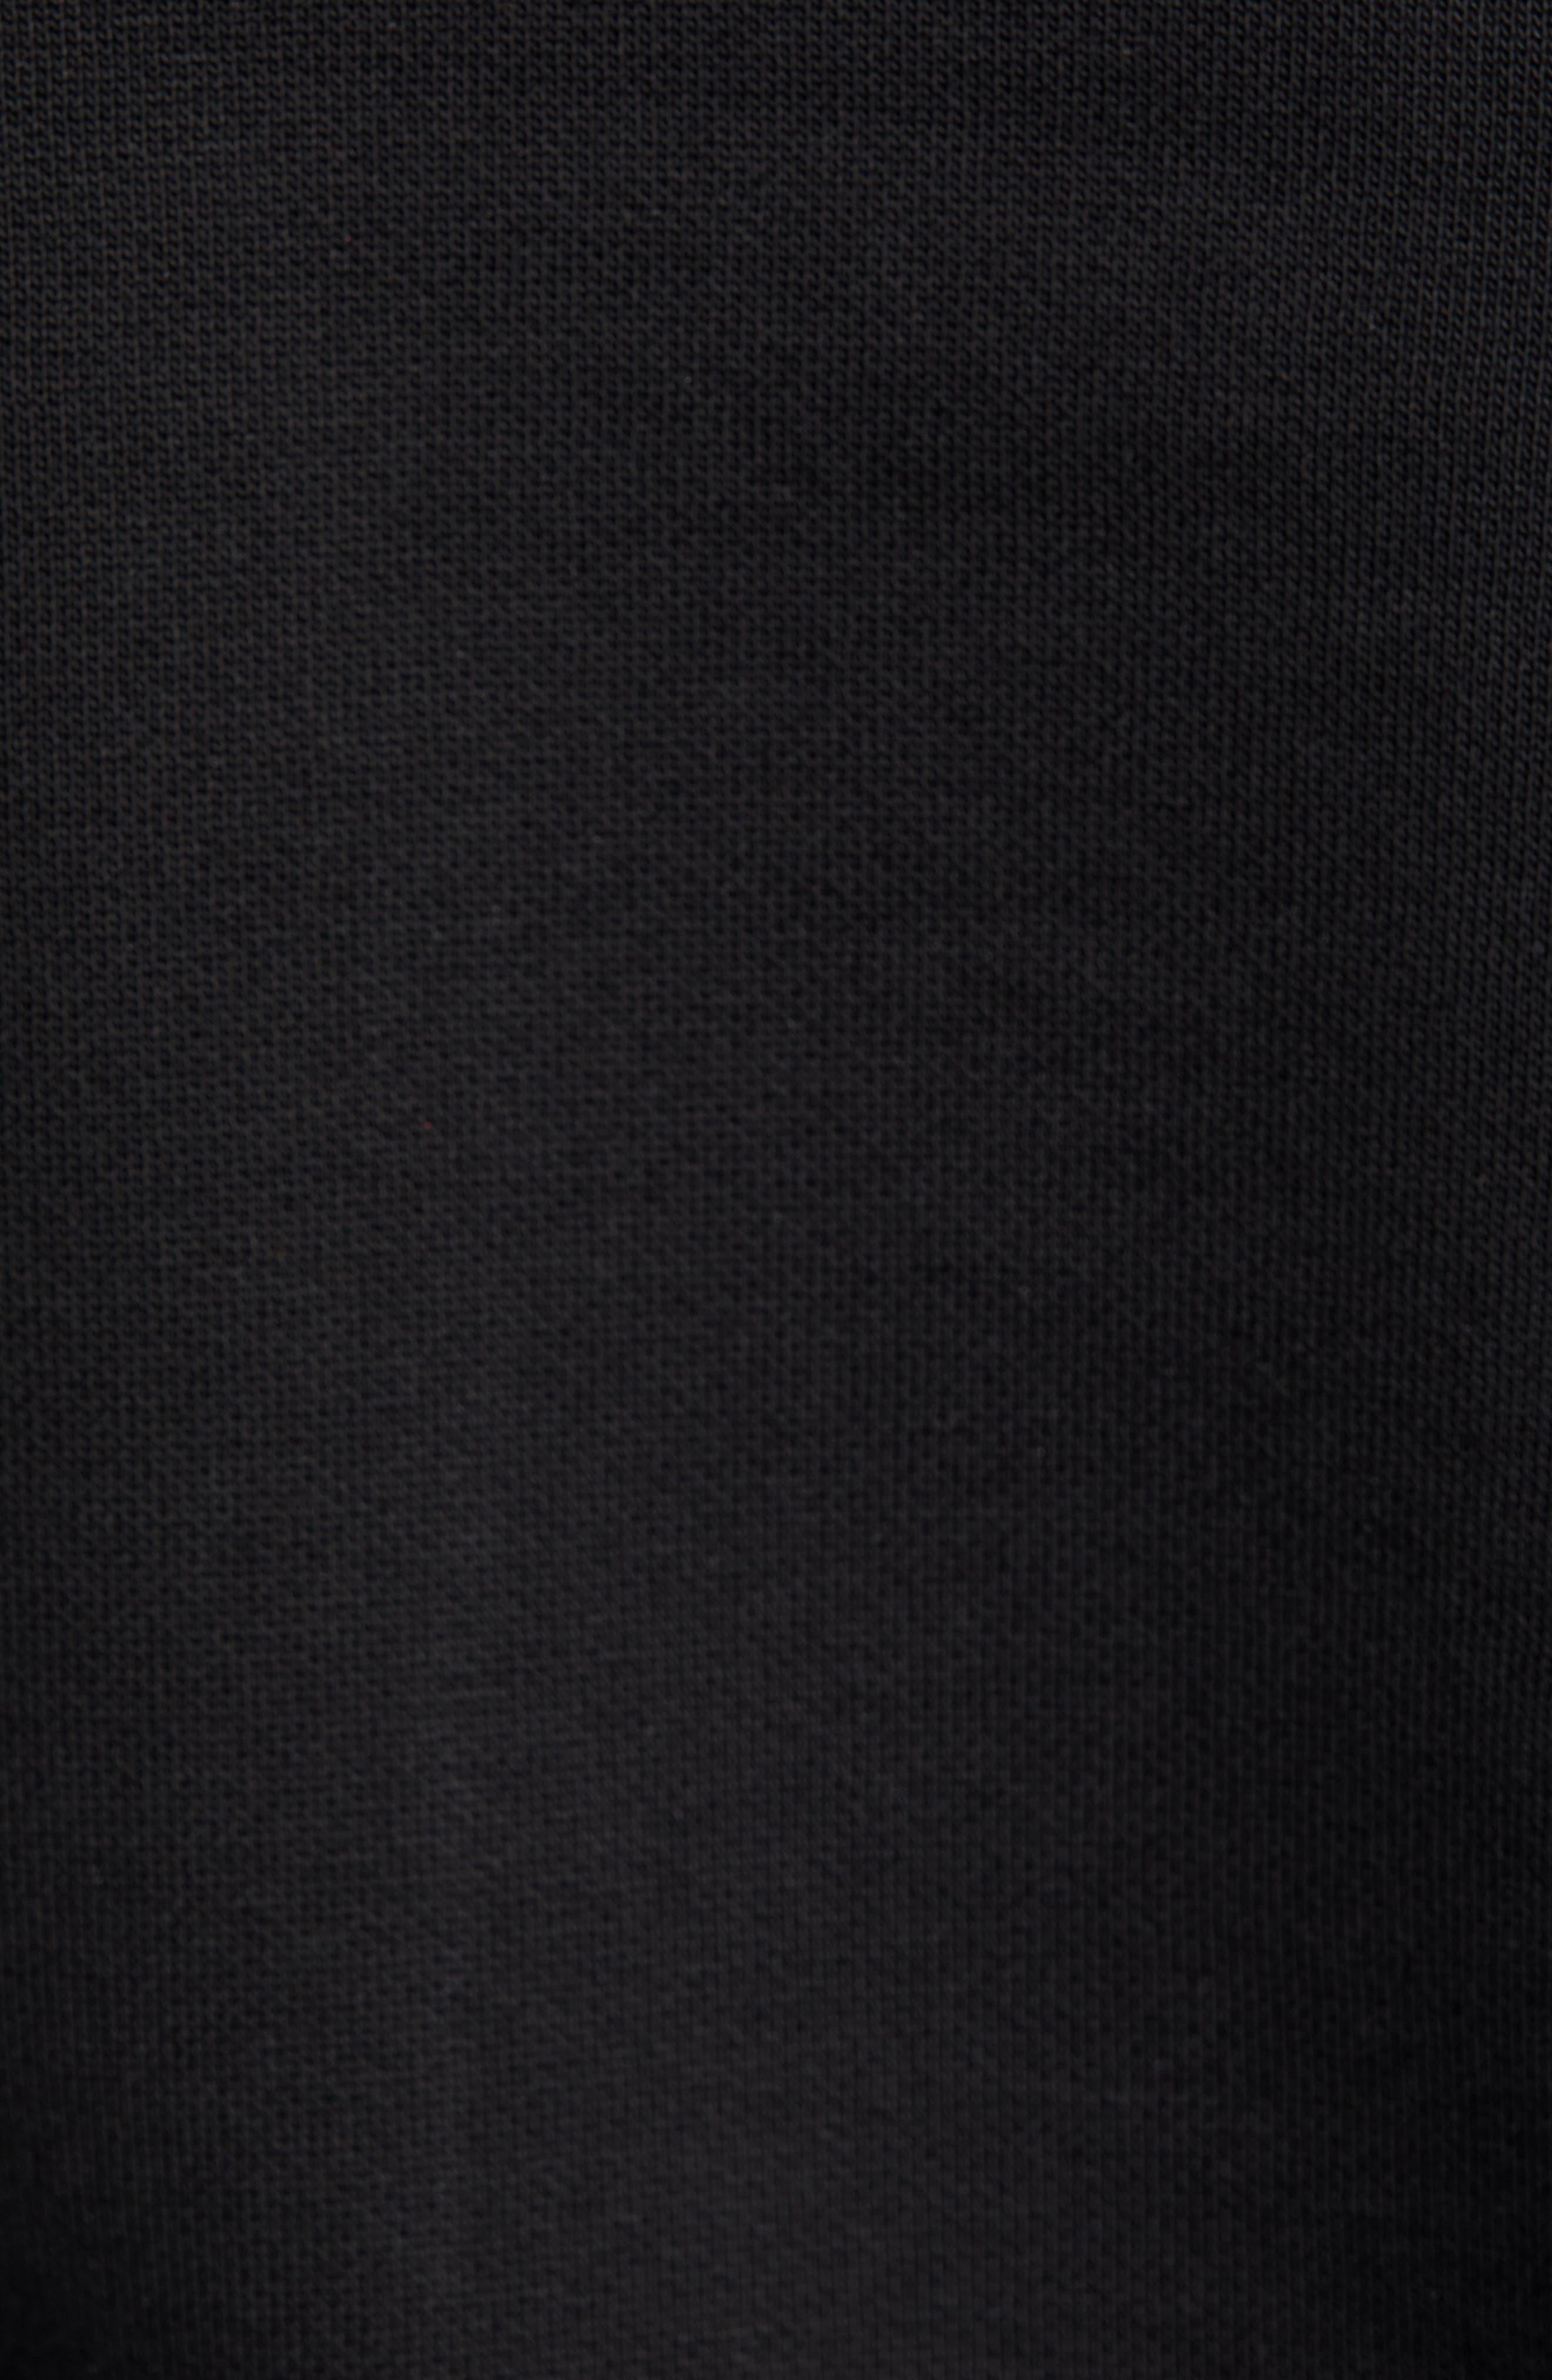 CARHARTT WORK IN PROGRESS, Logo Embroidered Hooded Sweatshirt, Alternate thumbnail 5, color, BLACK / WHITE